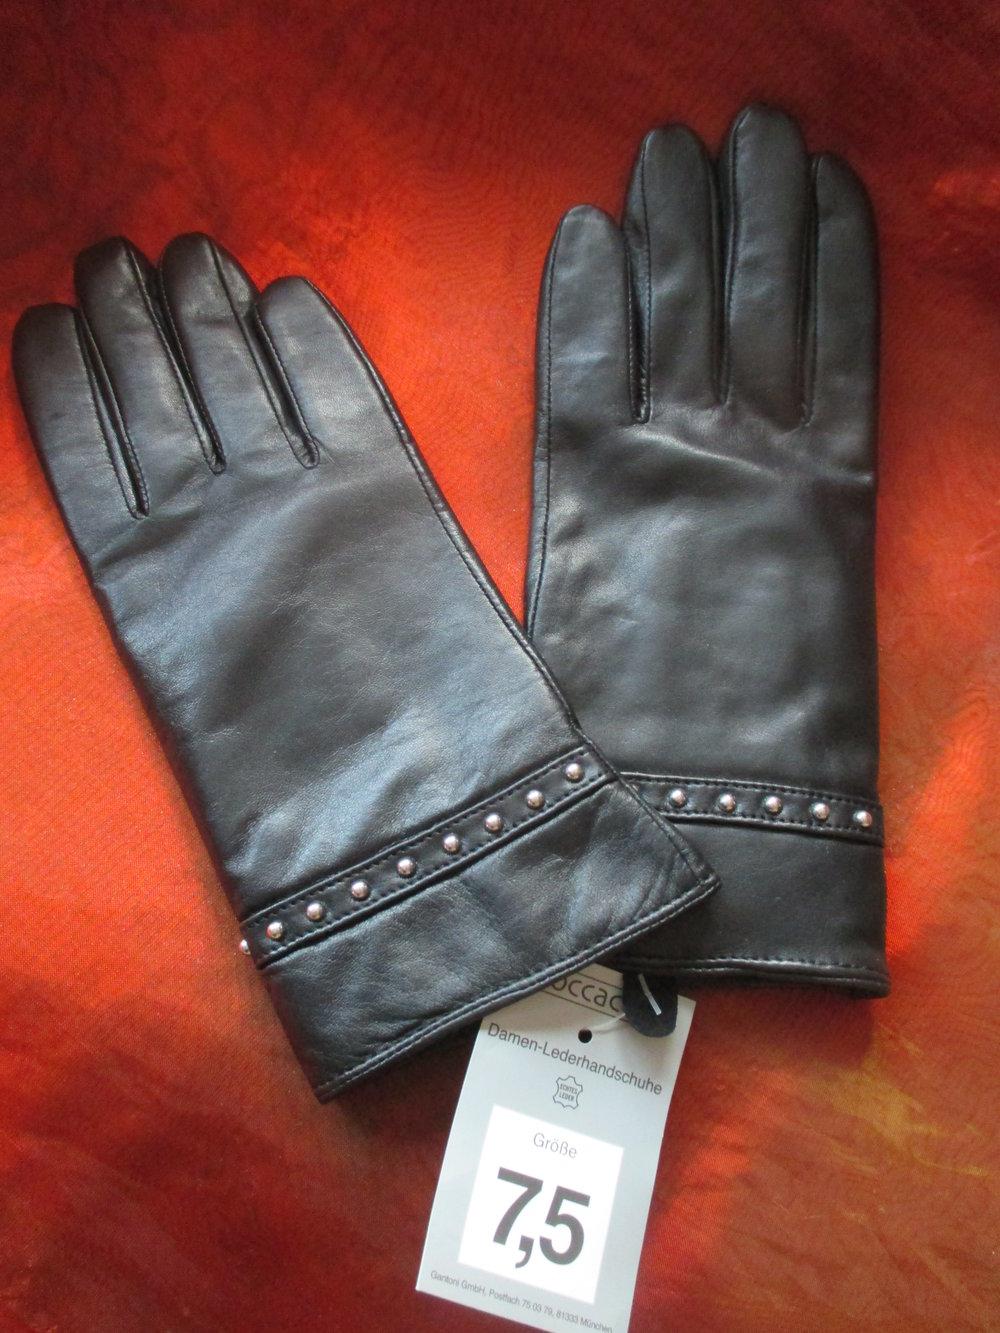 NEU mit ETIKETT DESIGNER Echt Lamm Napa Leder Nieten Finger Handschuhe Fingerhandschuhe Lederhandschuhe Fake Fur Futter Grösse 7,5 schwarz silber